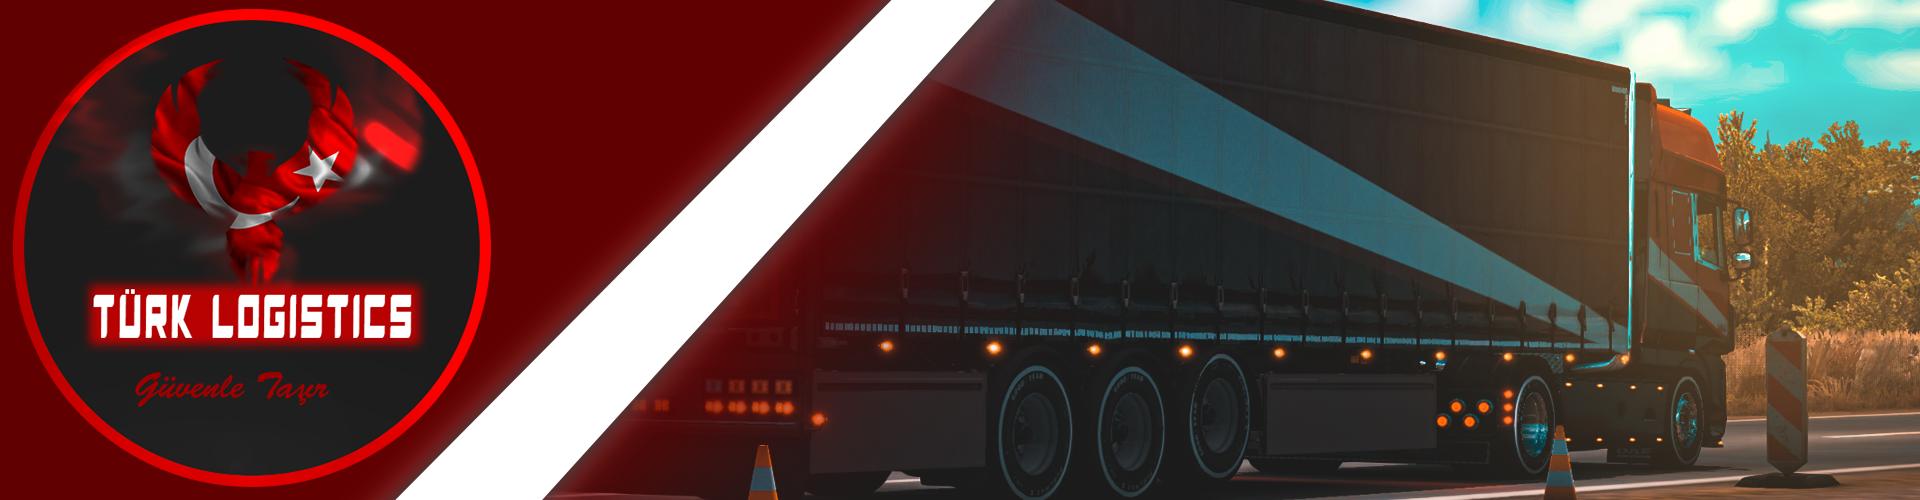 Türk Logistics® 19 Mayıs Konvoyu